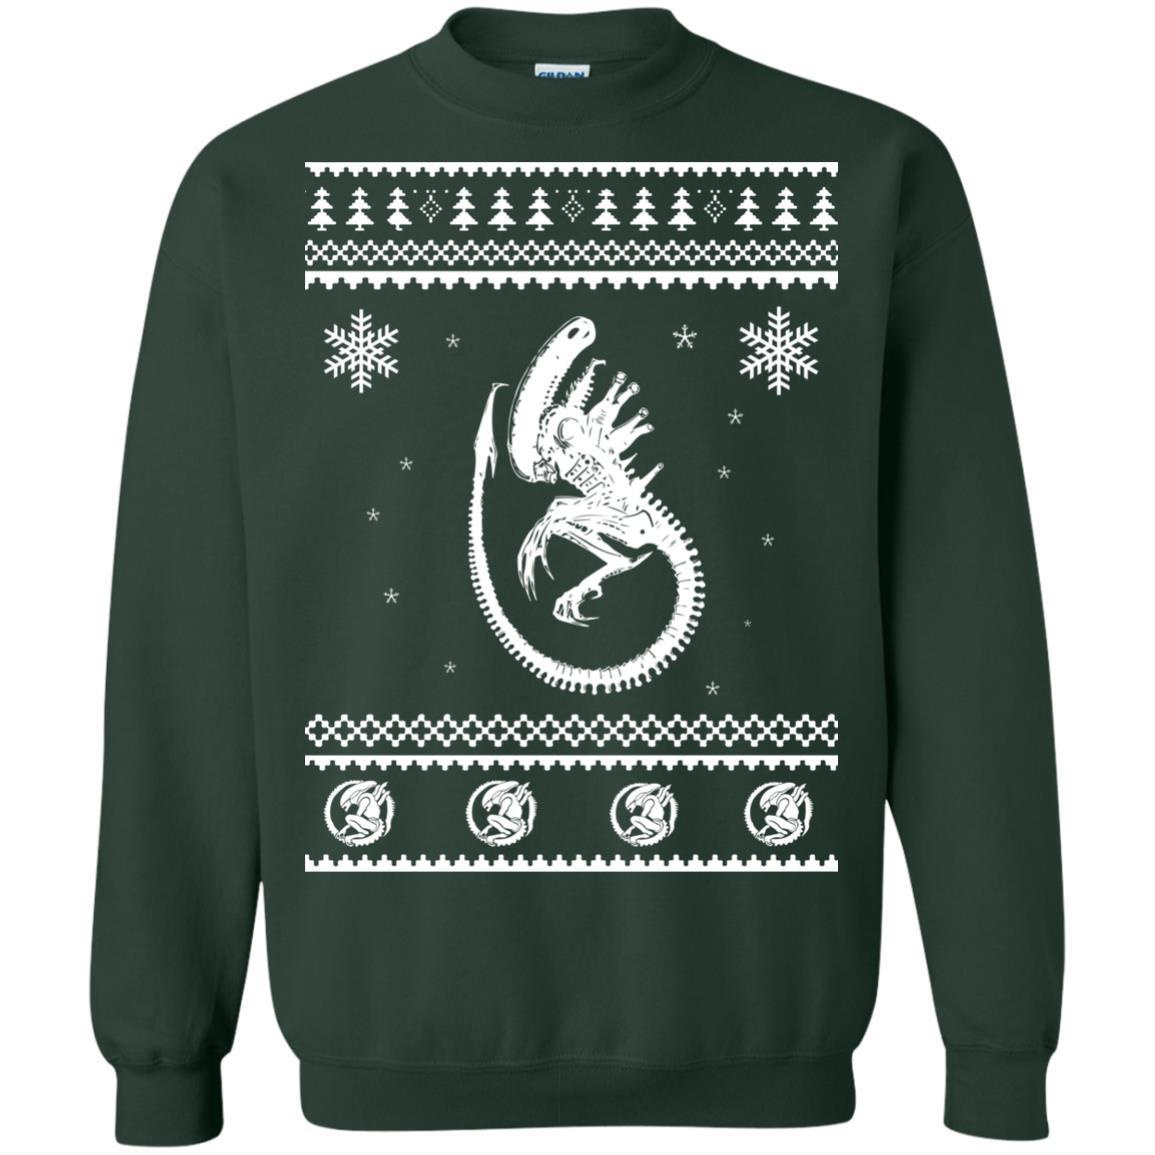 image 2850 - Xeno-mas - Aliens Xenomorph Christmas Sweater, Shirt, Hoodie